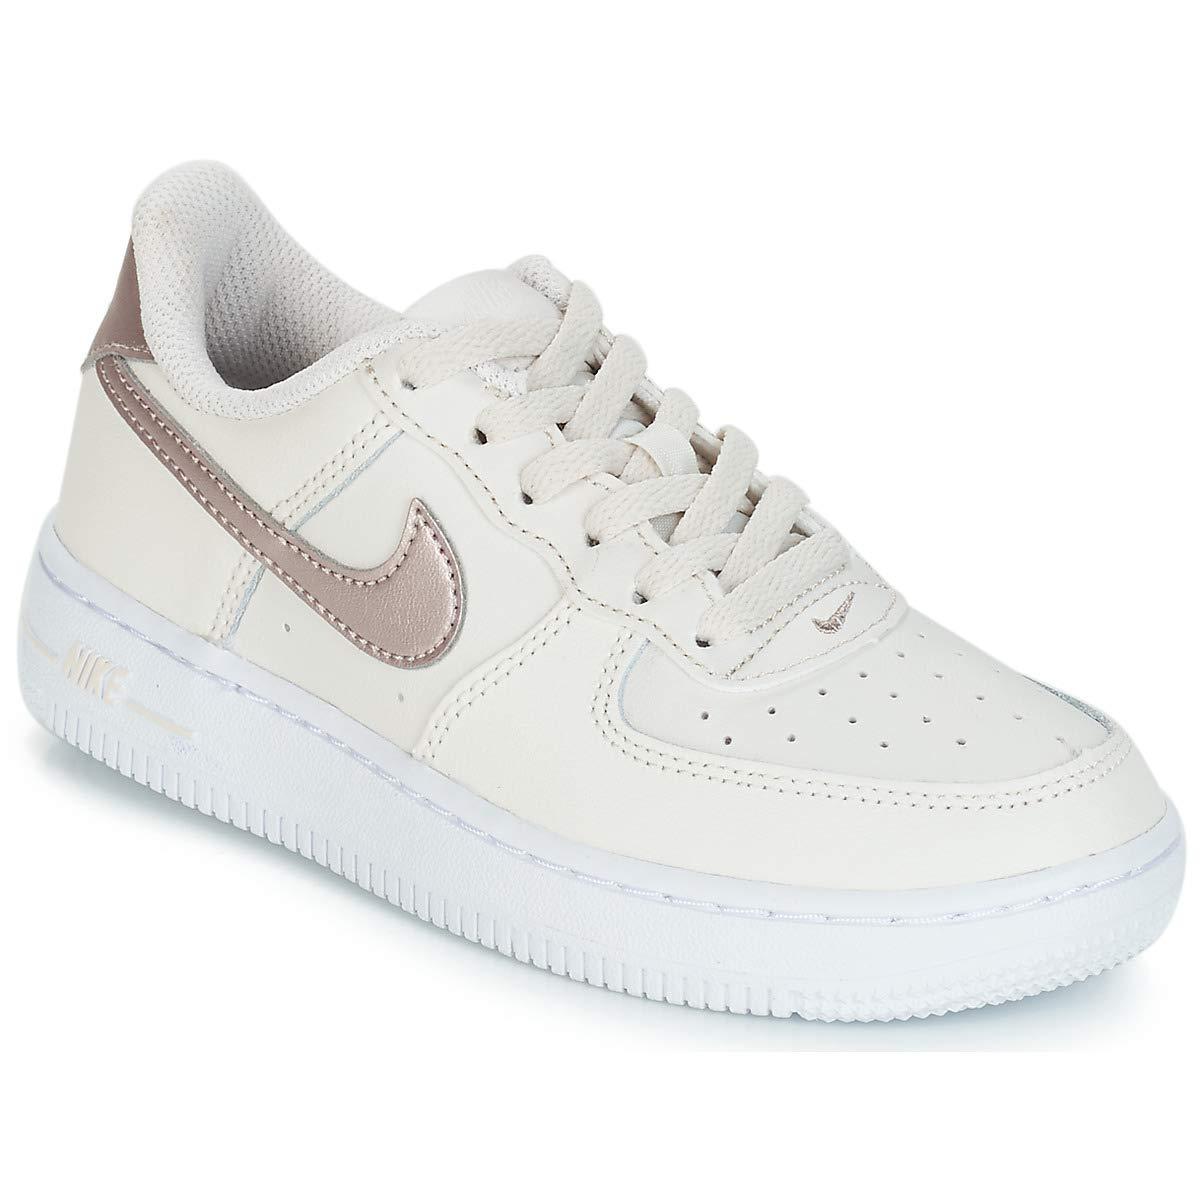 Nike Herren Herren Herren Reax 8 Tr Fitnessschuhe  8f8547